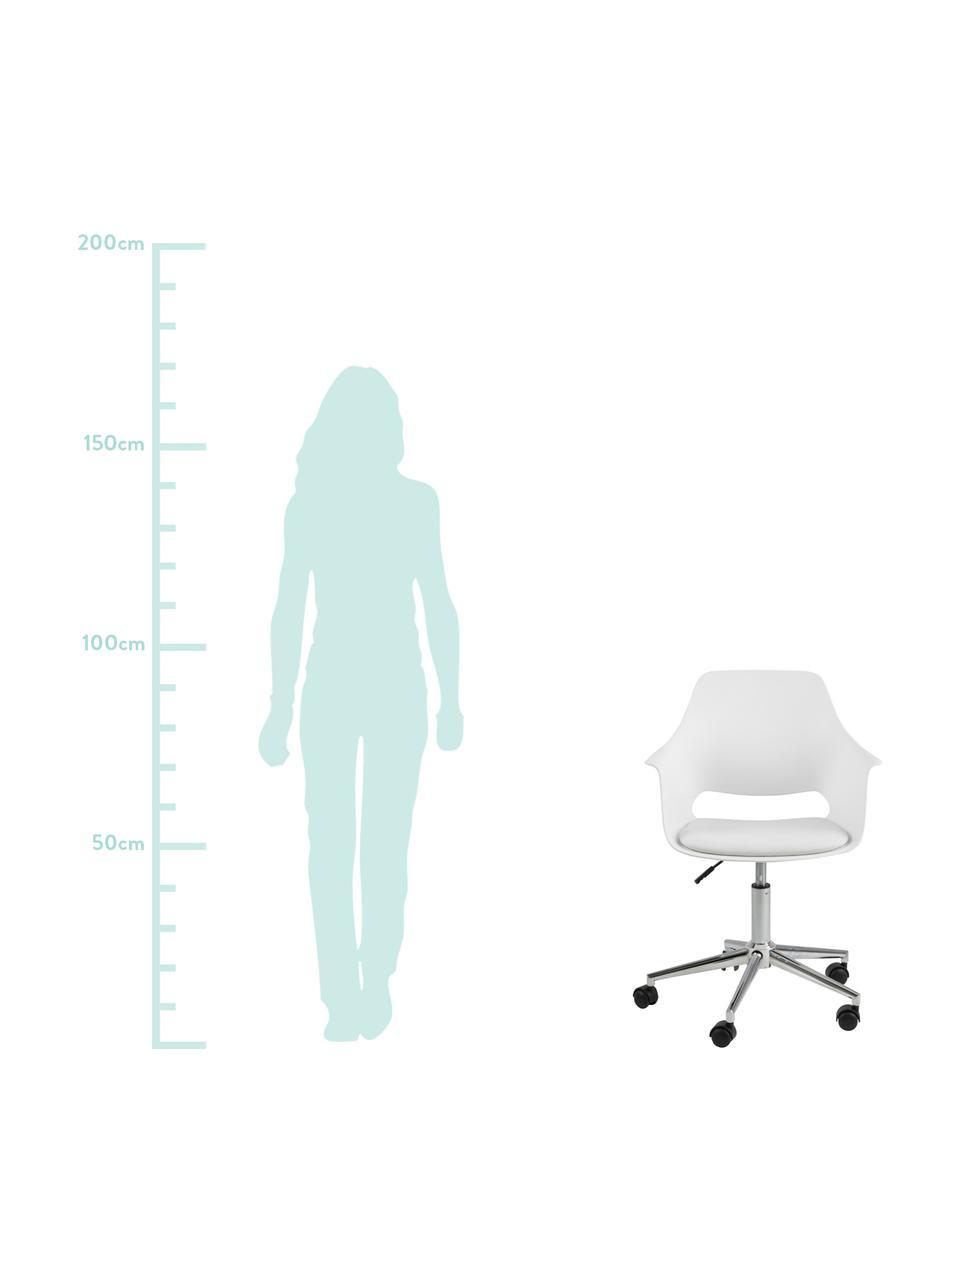 Bürodrehstuhl Ramona, höhenverstellbar, Beine: Metall, verchromt, Weiß, B 57 x T 53 cm